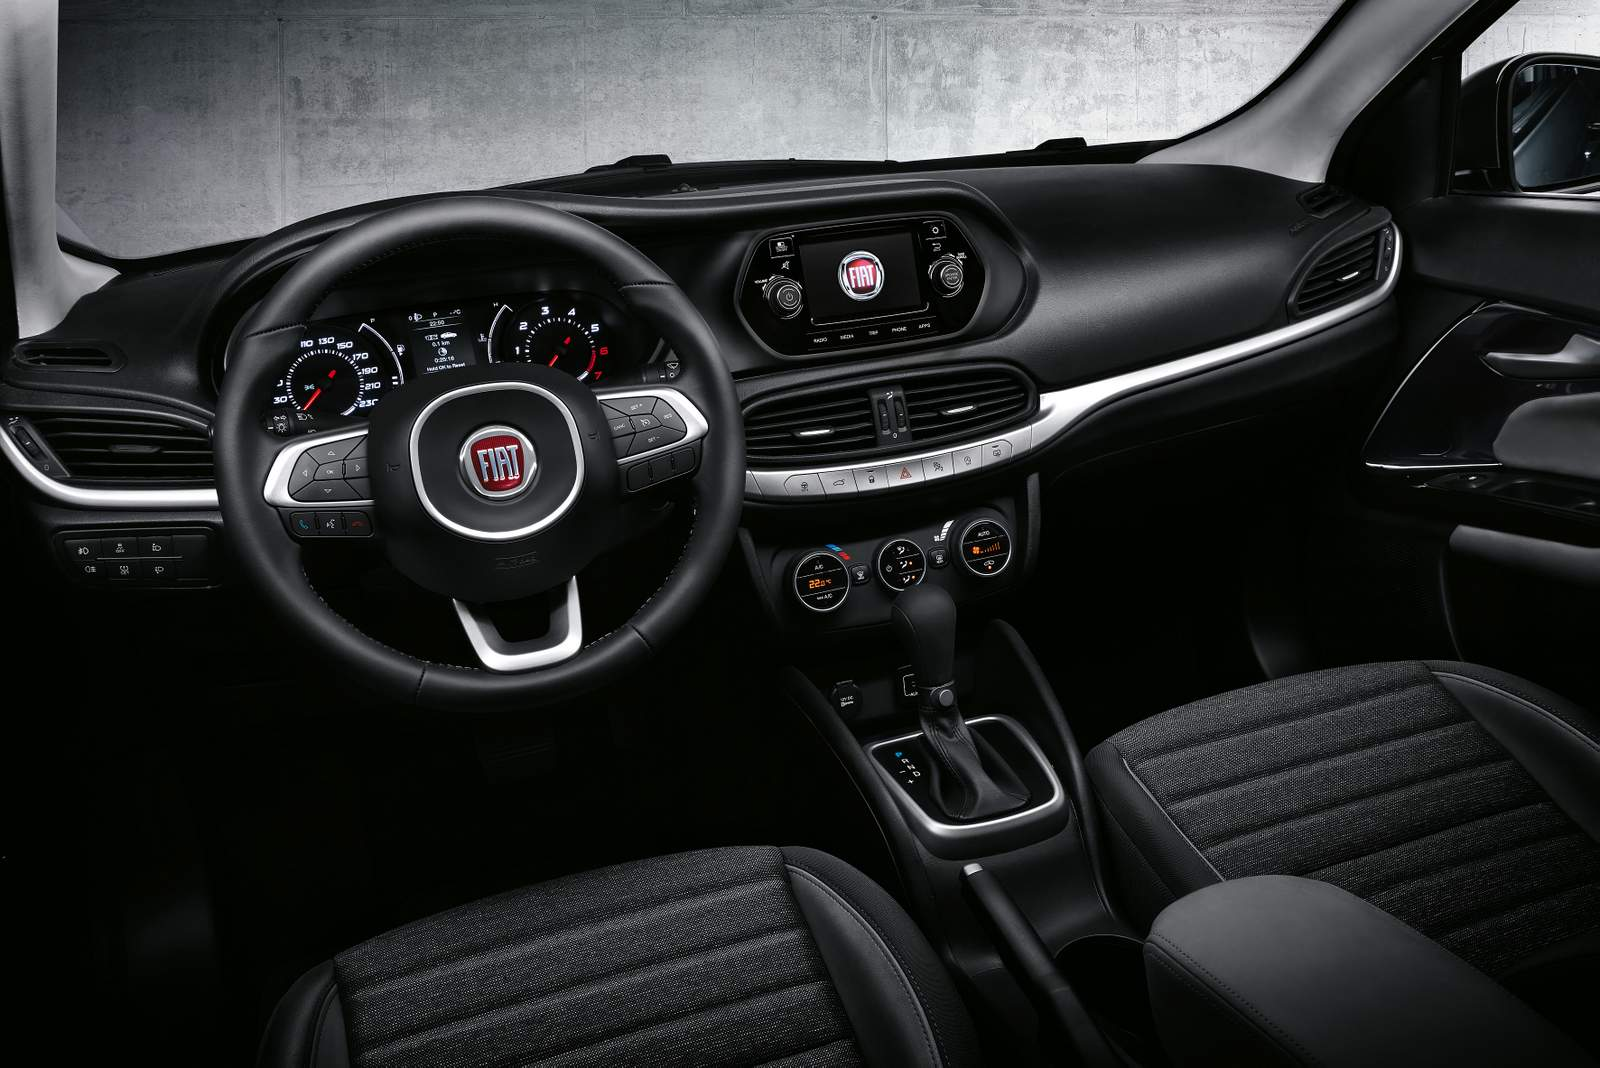 Novo Fiat Linea 2016 - Fiat Agea